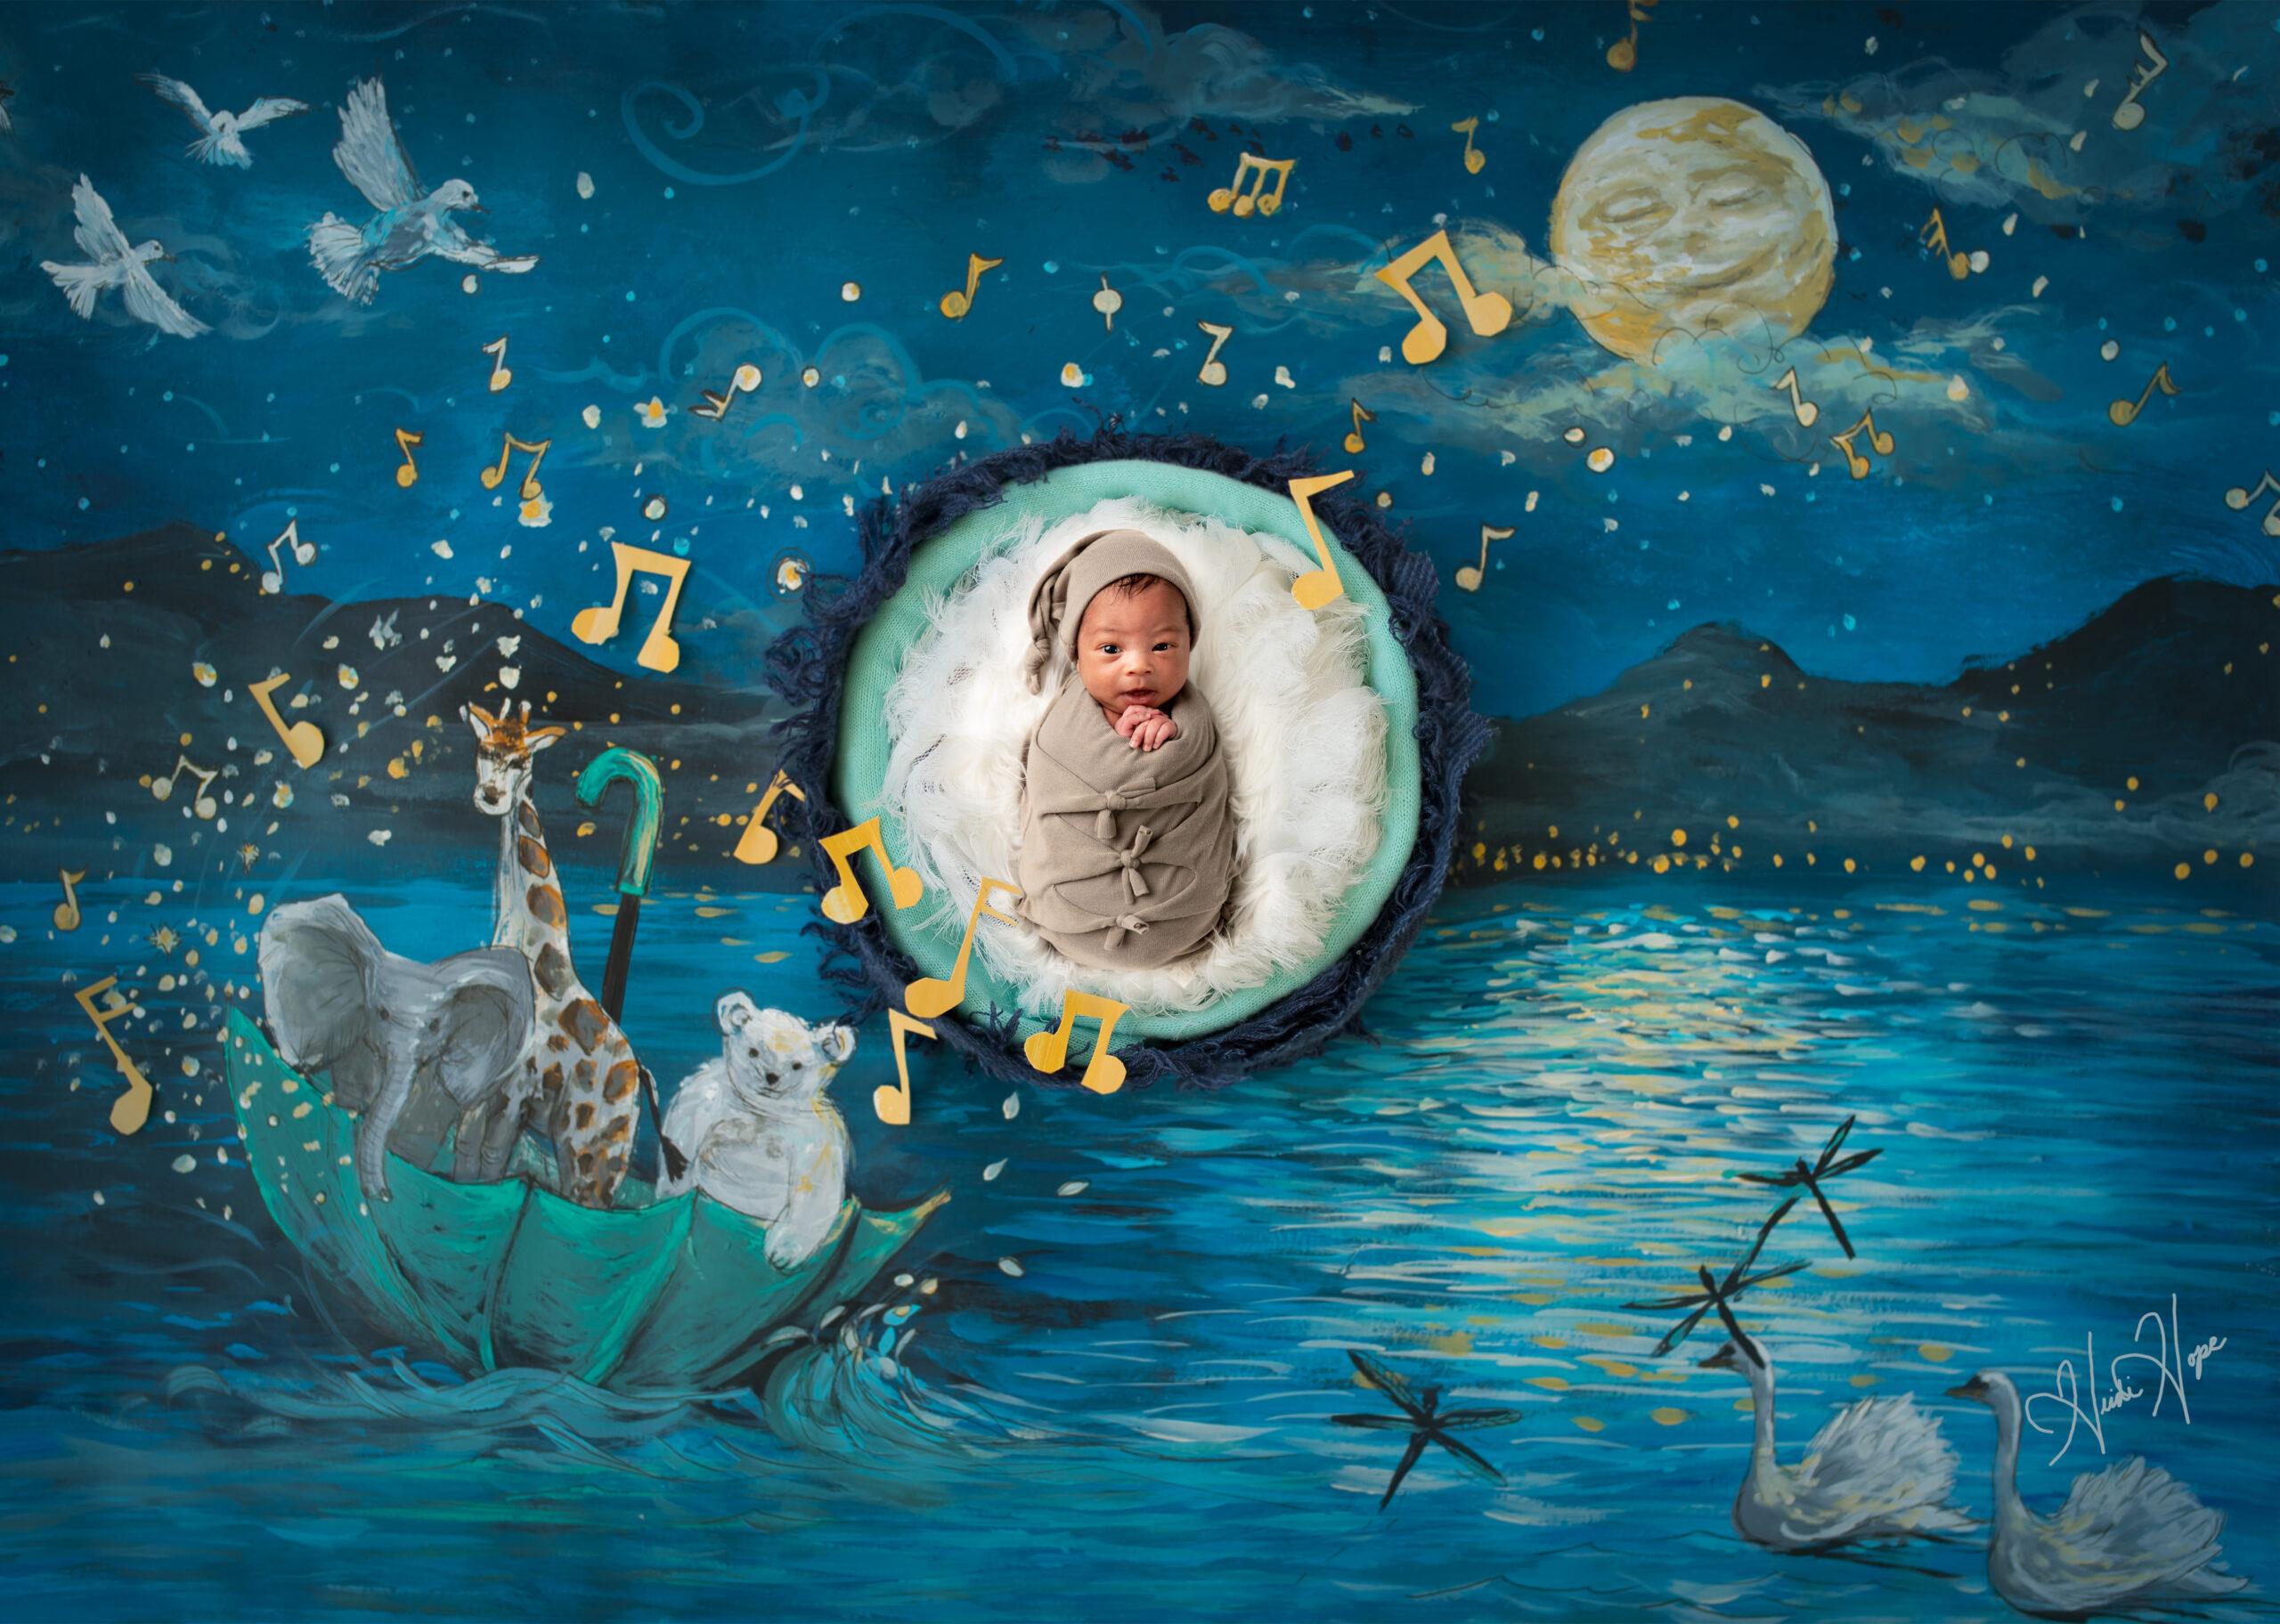 On the night you were born digital backdrop